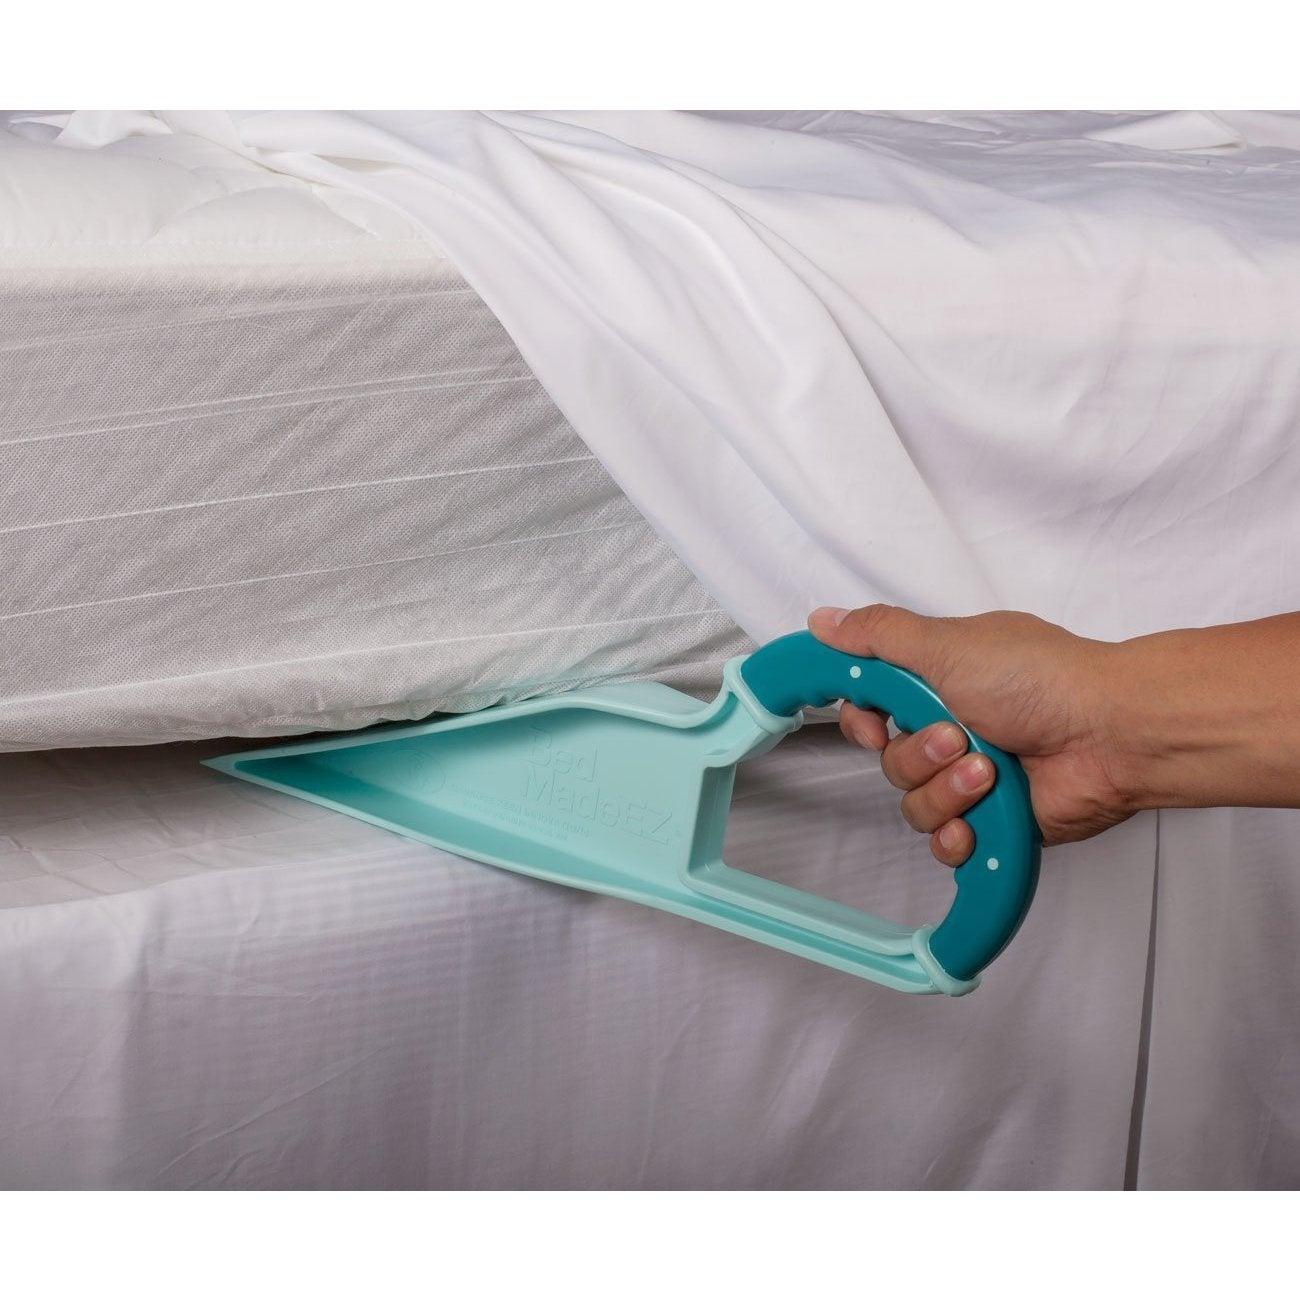 Kotter Home Easy Bed Making Wedge Bed Made EZ Blue Mattre...